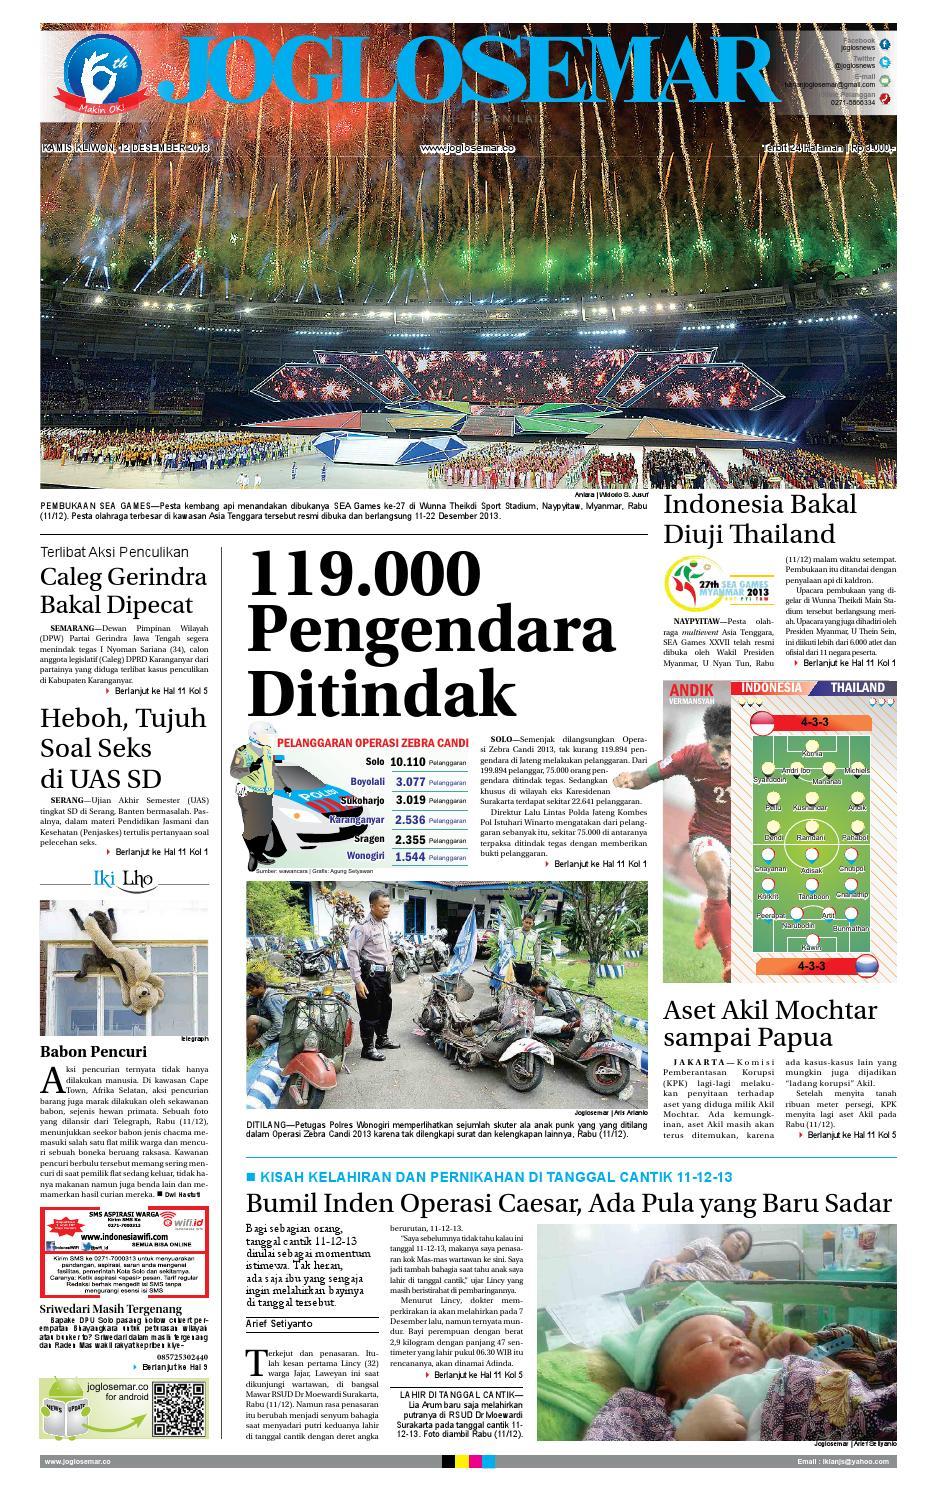 Epaper Edisi 28 Nopember 2013 By Pt Joglosemar Prima Media Issuu Rejeki Anak Soleh 3 Agip 4t Super 1l 12 Desember